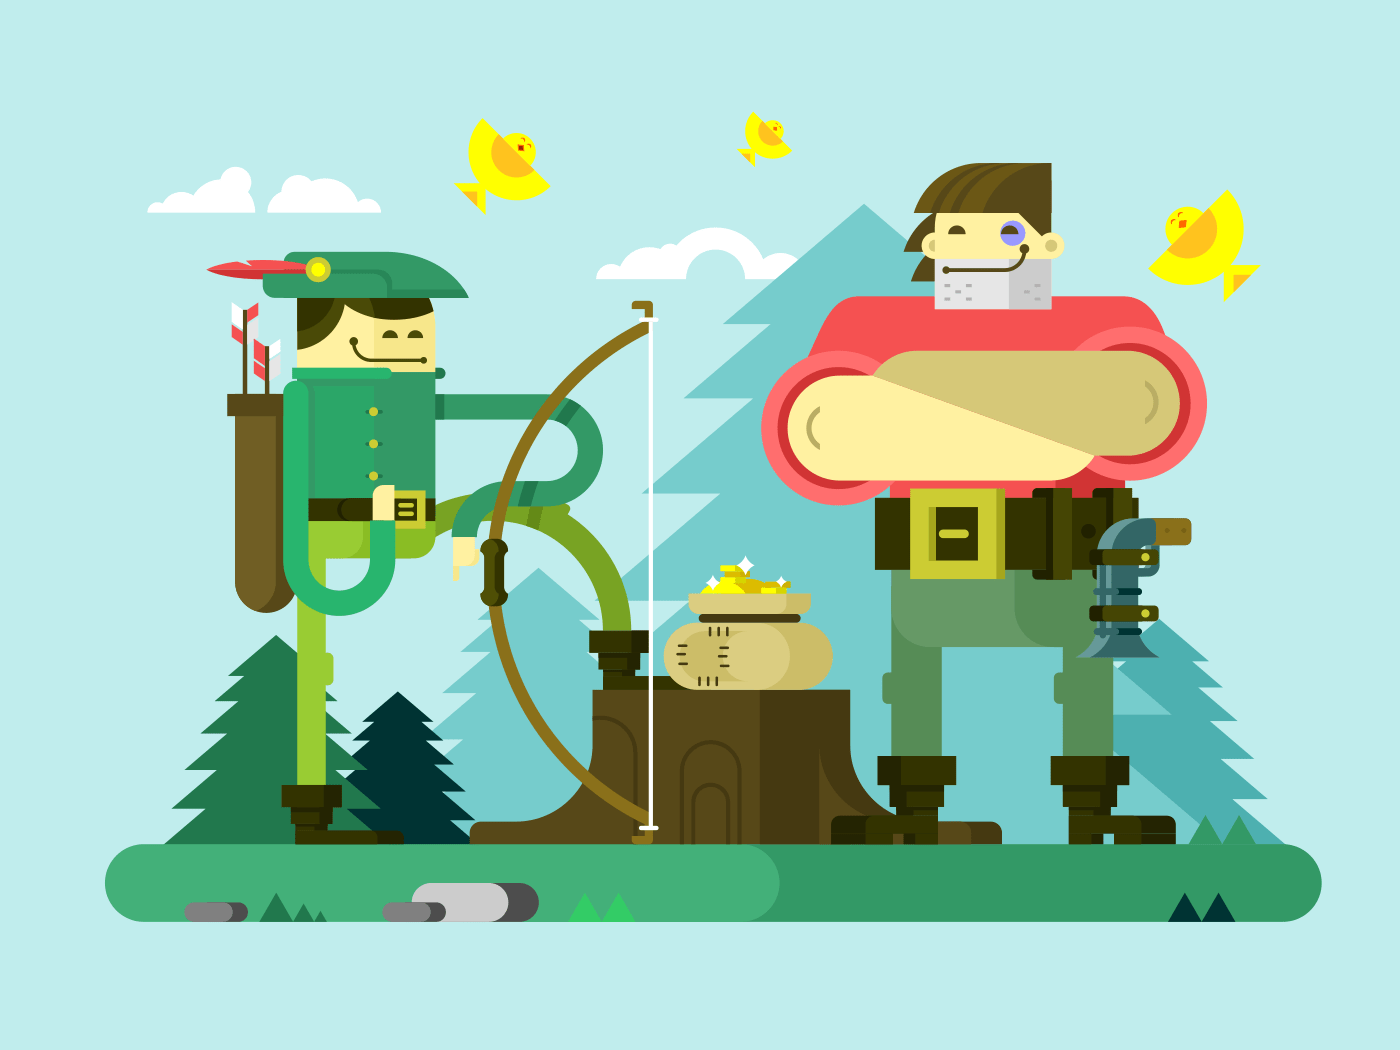 Character of Robin Hood flat vector illustration